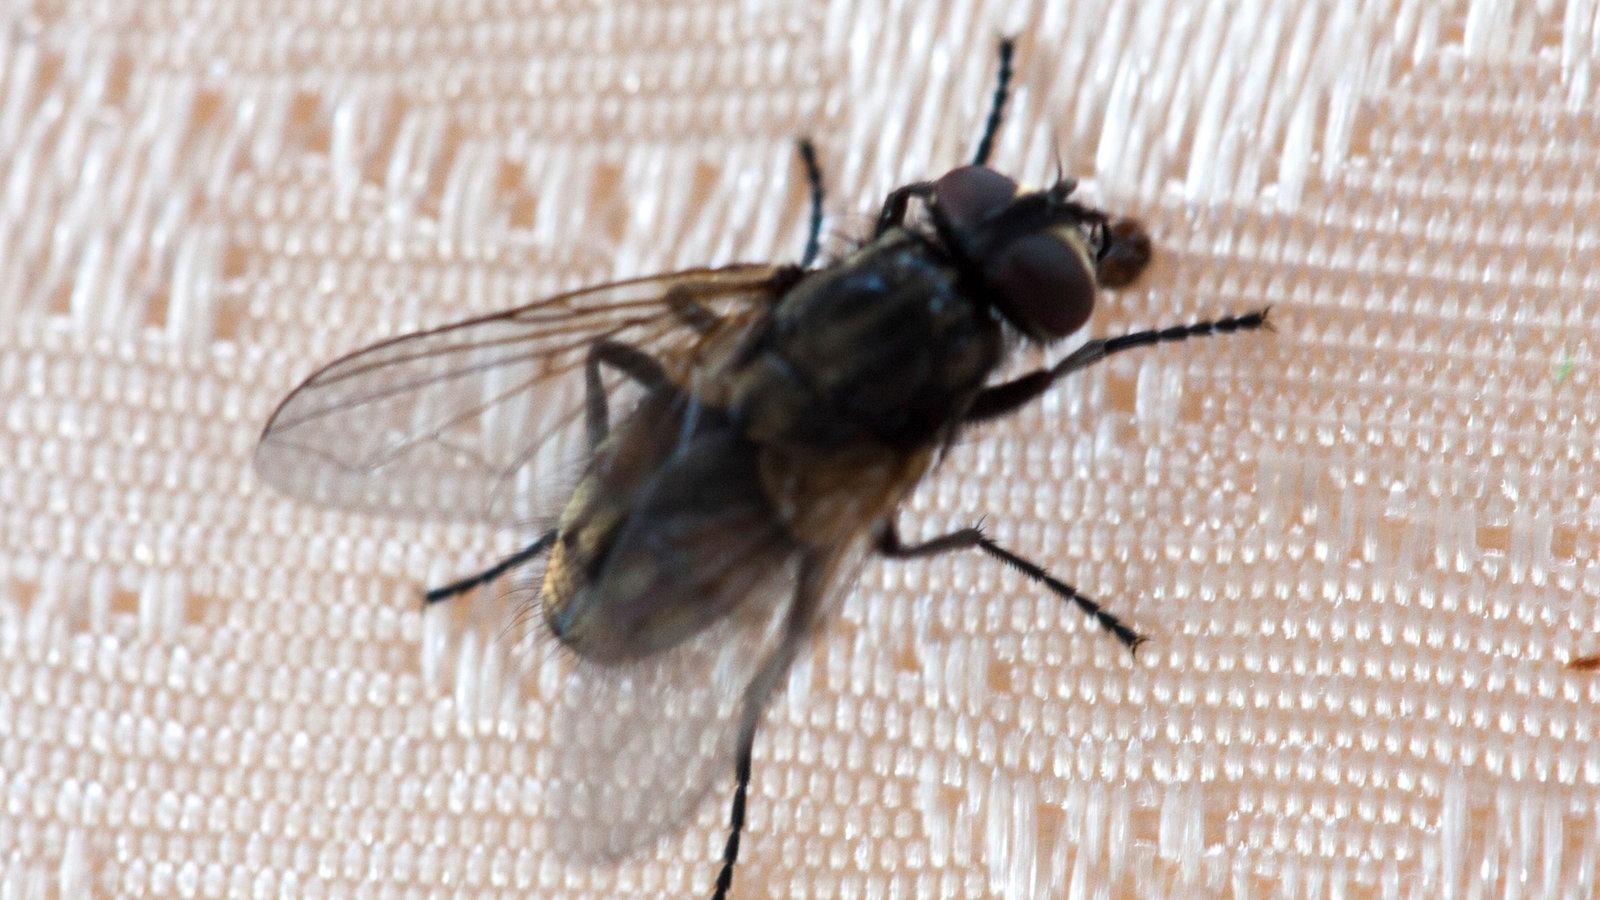 fliegen nervige superhelden natur wissen wdr. Black Bedroom Furniture Sets. Home Design Ideas